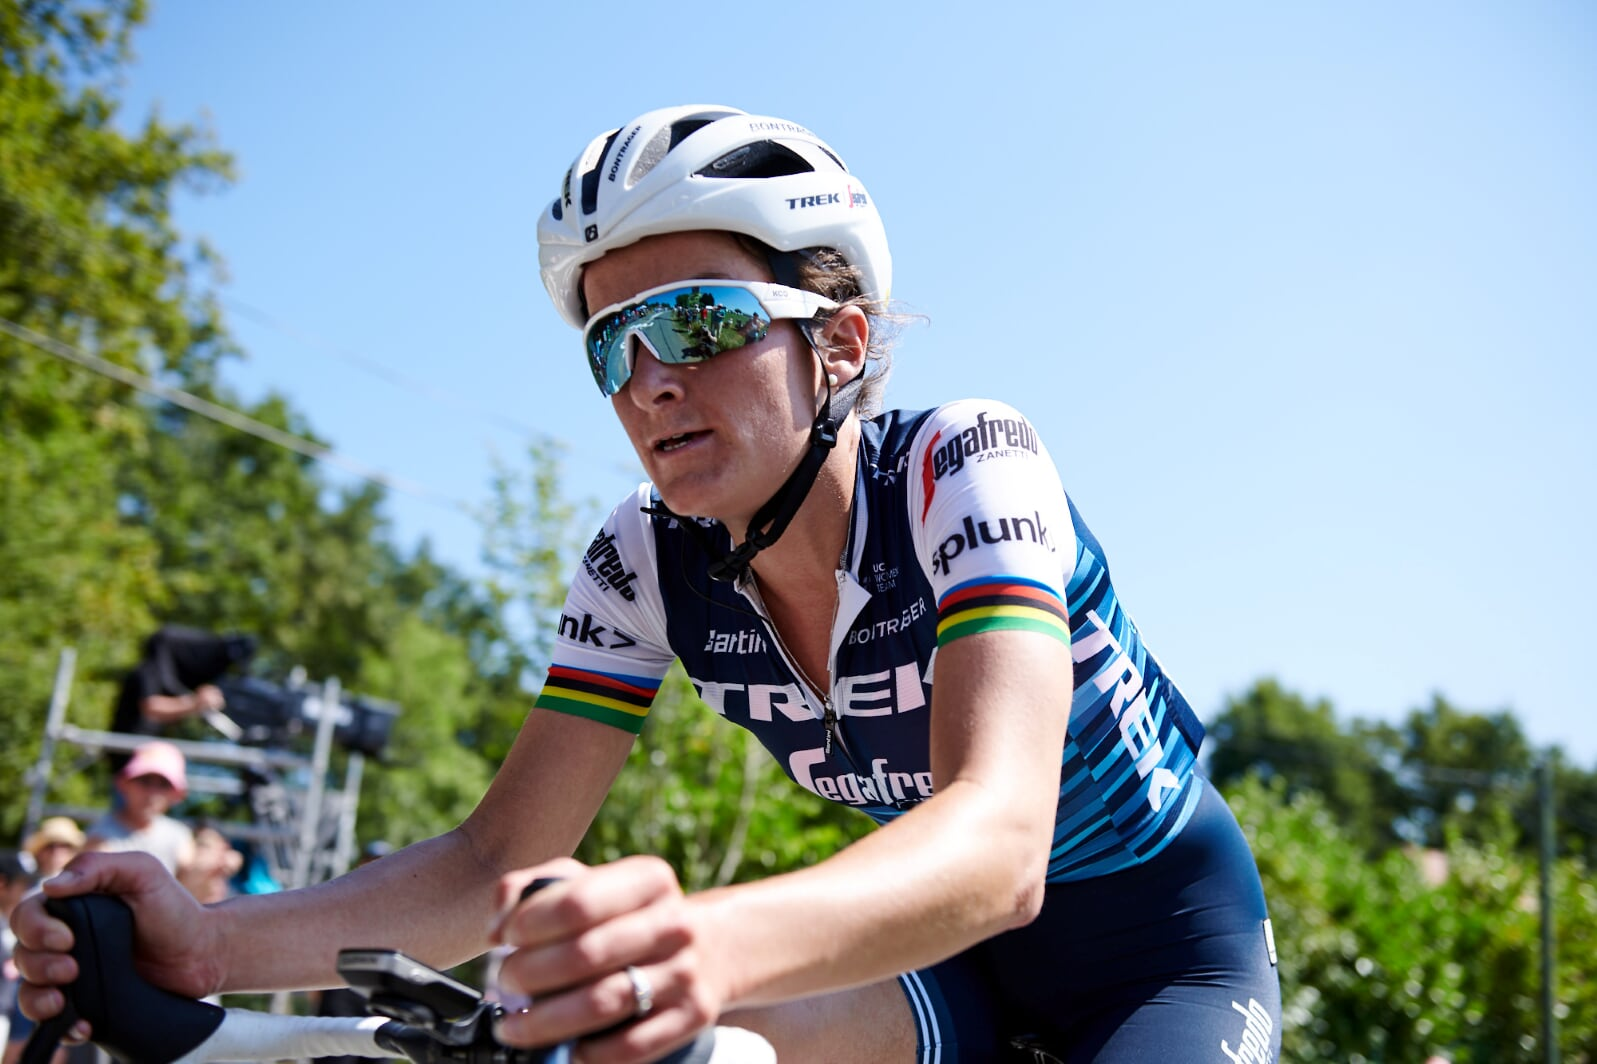 lizzie-deignan-mamma-ciclista